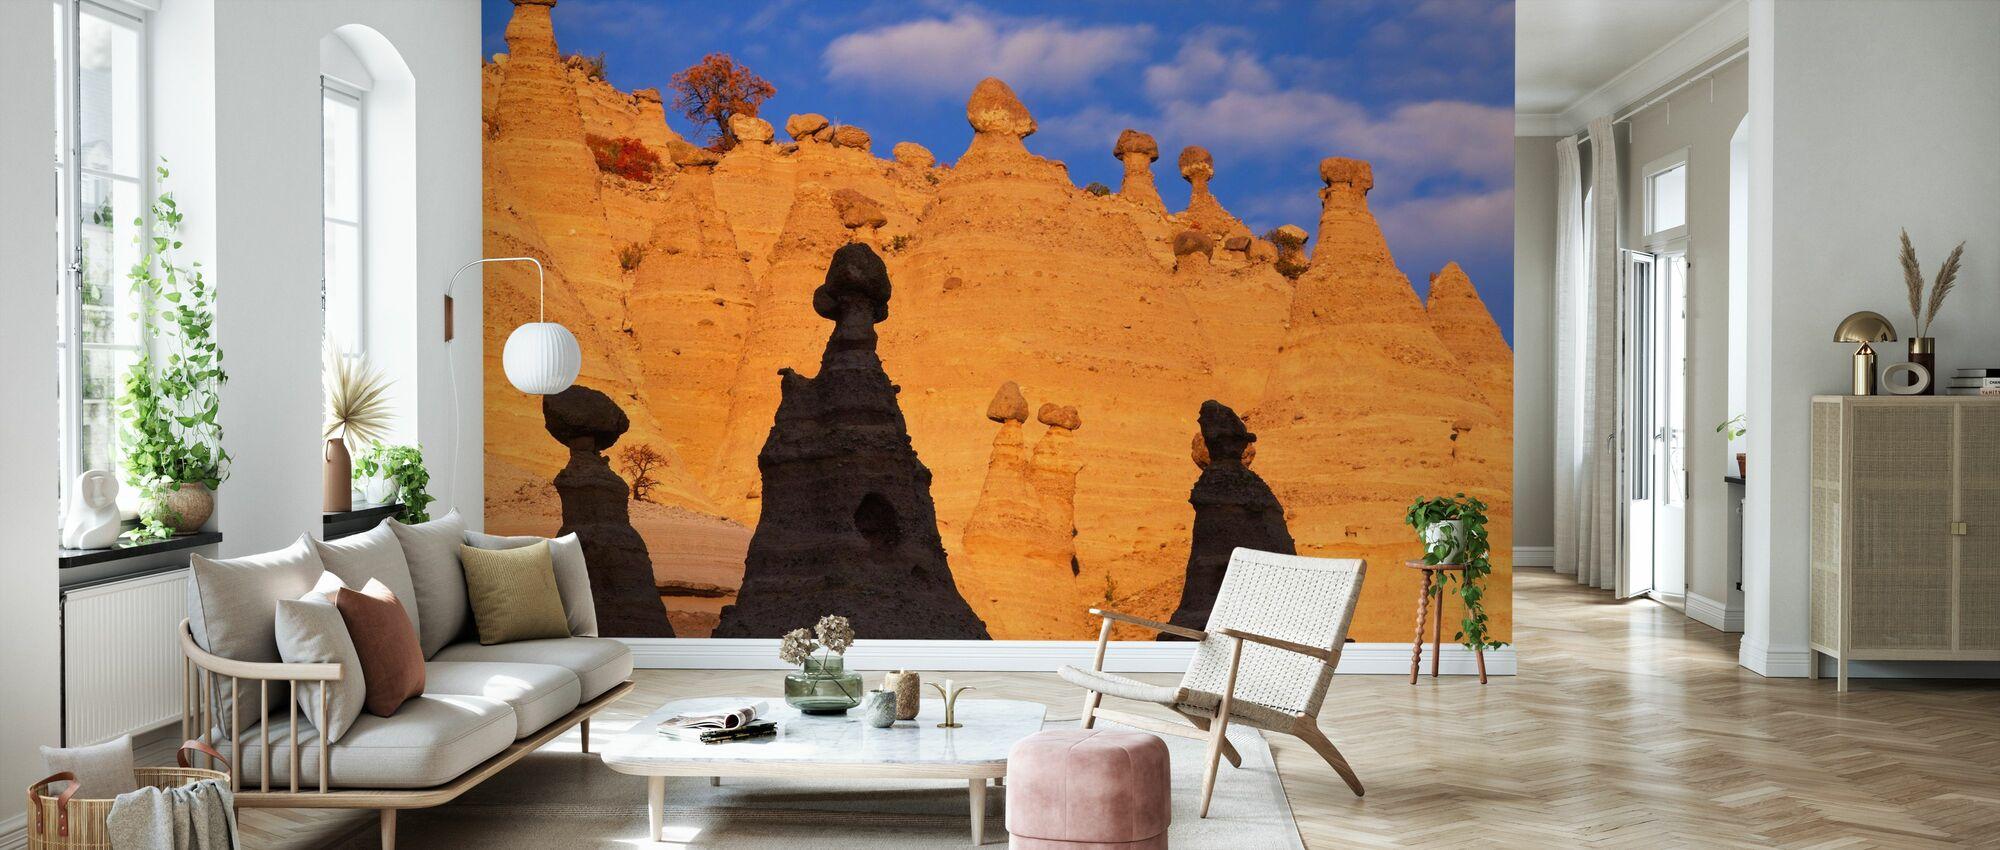 Tent Rocks - Wallpaper - Living Room